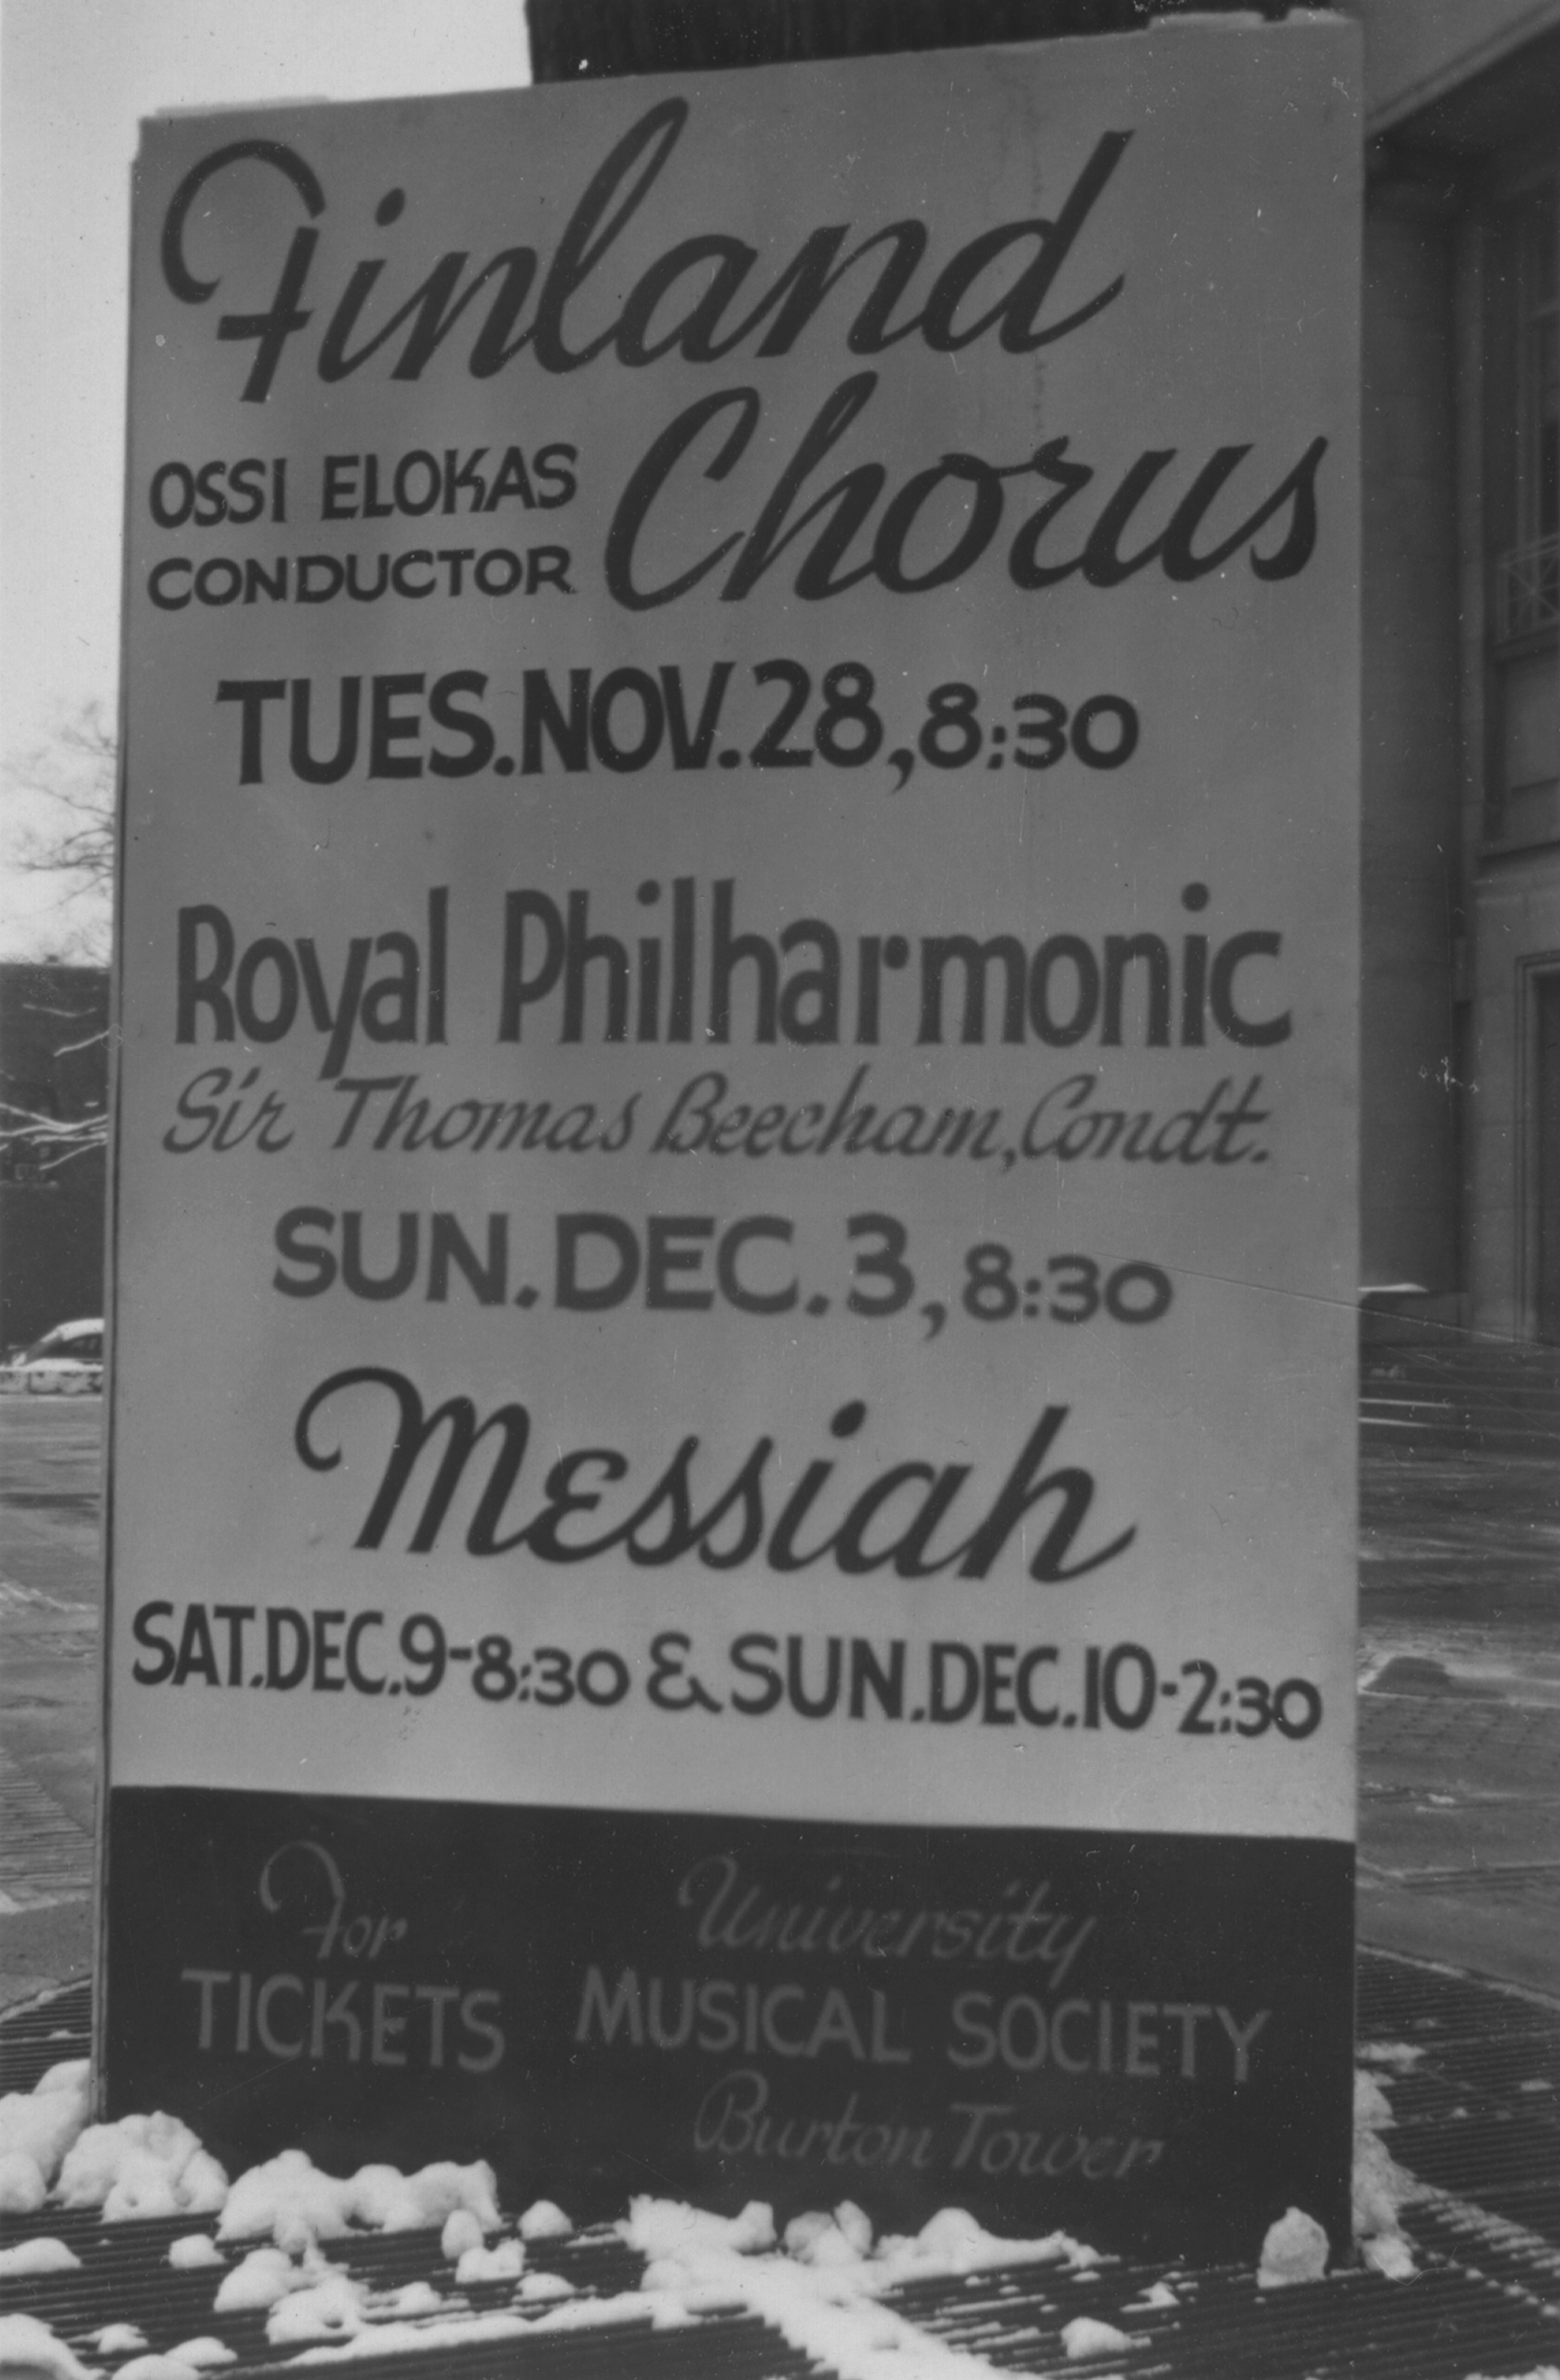 Finland Chorus with Ossi Elokas, Royal Philharmonic with Sir Thomas Beecham, Messiah